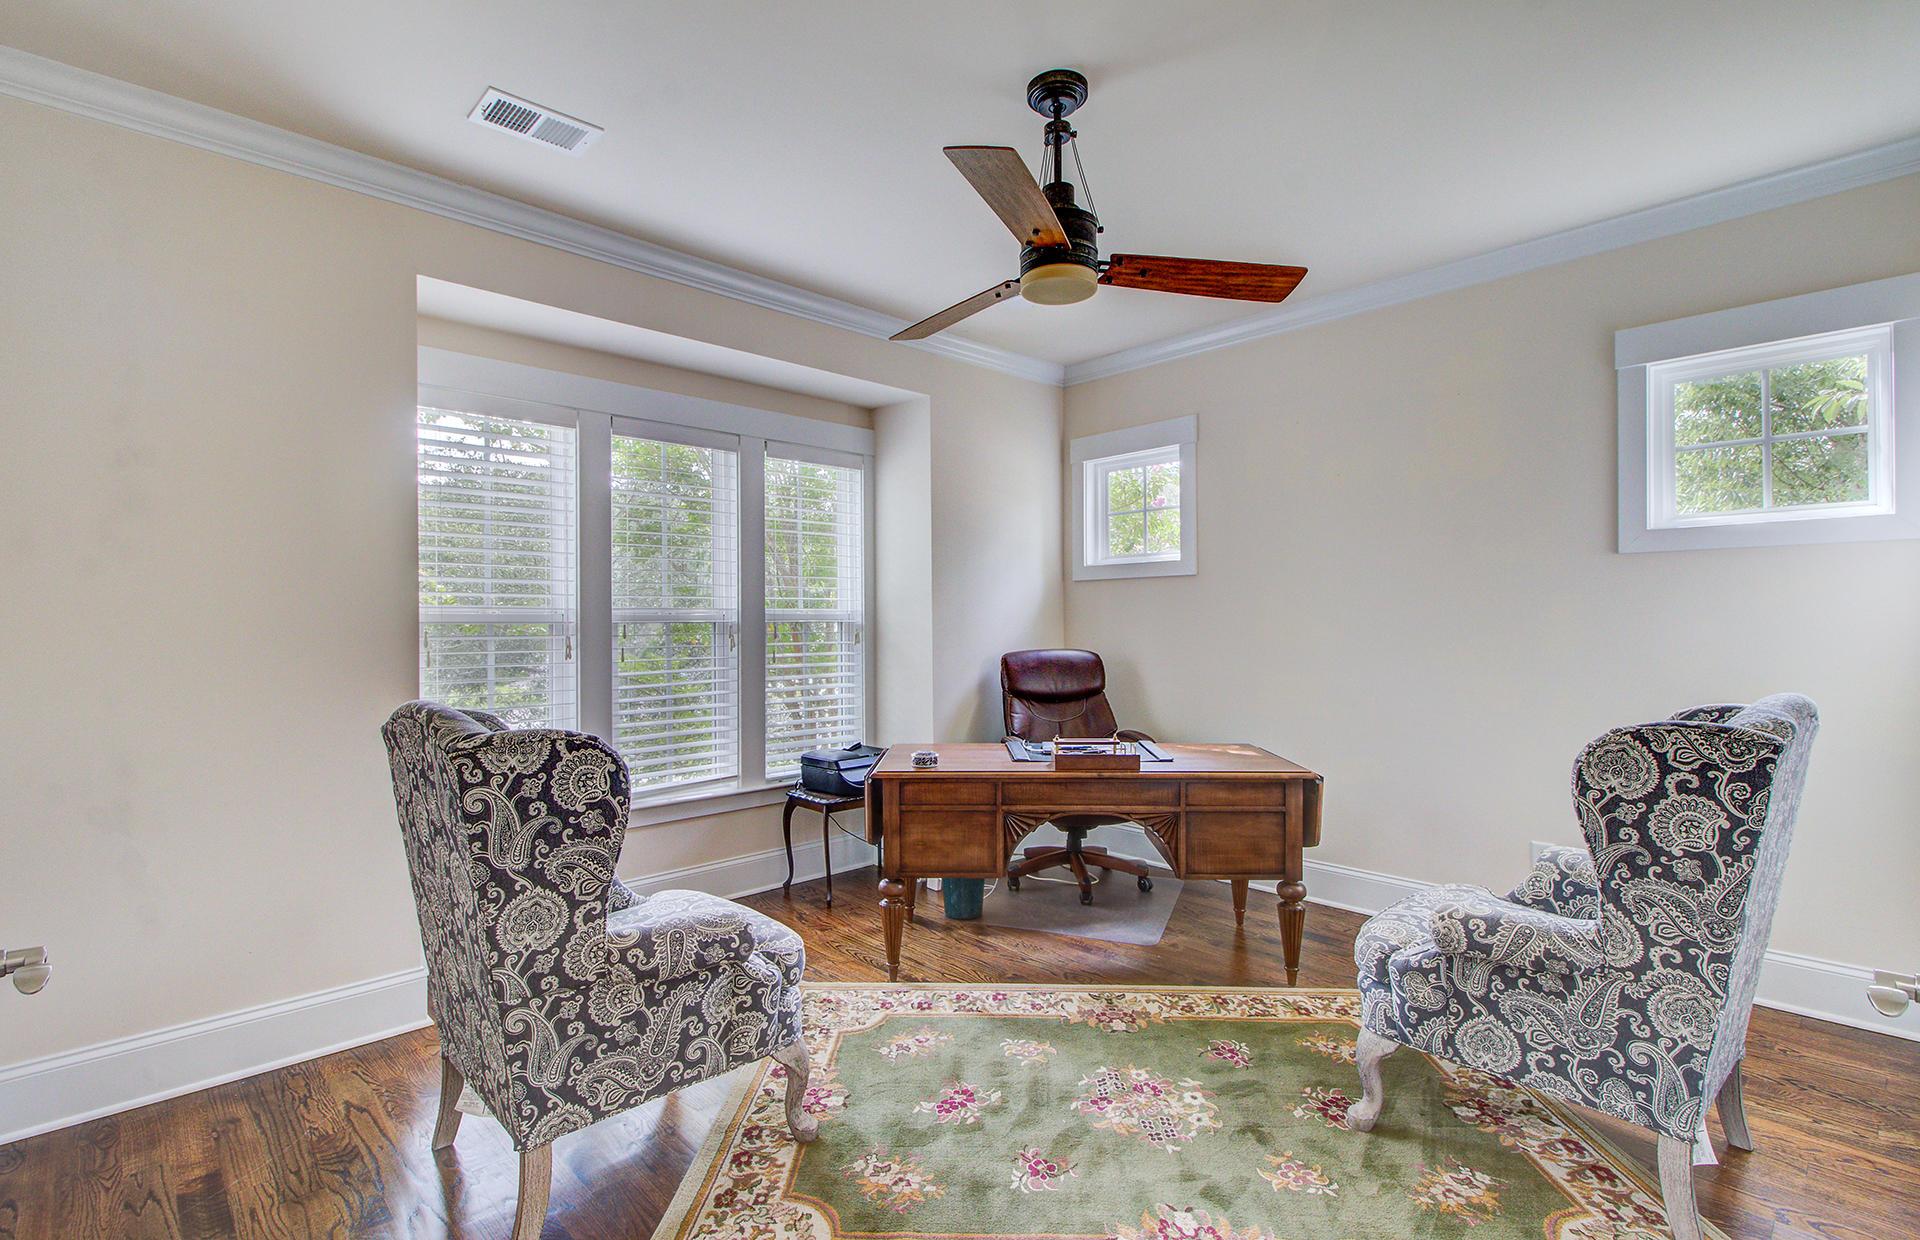 Scotts Creek Homes For Sale - 1404 Scotts Creek, Mount Pleasant, SC - 53